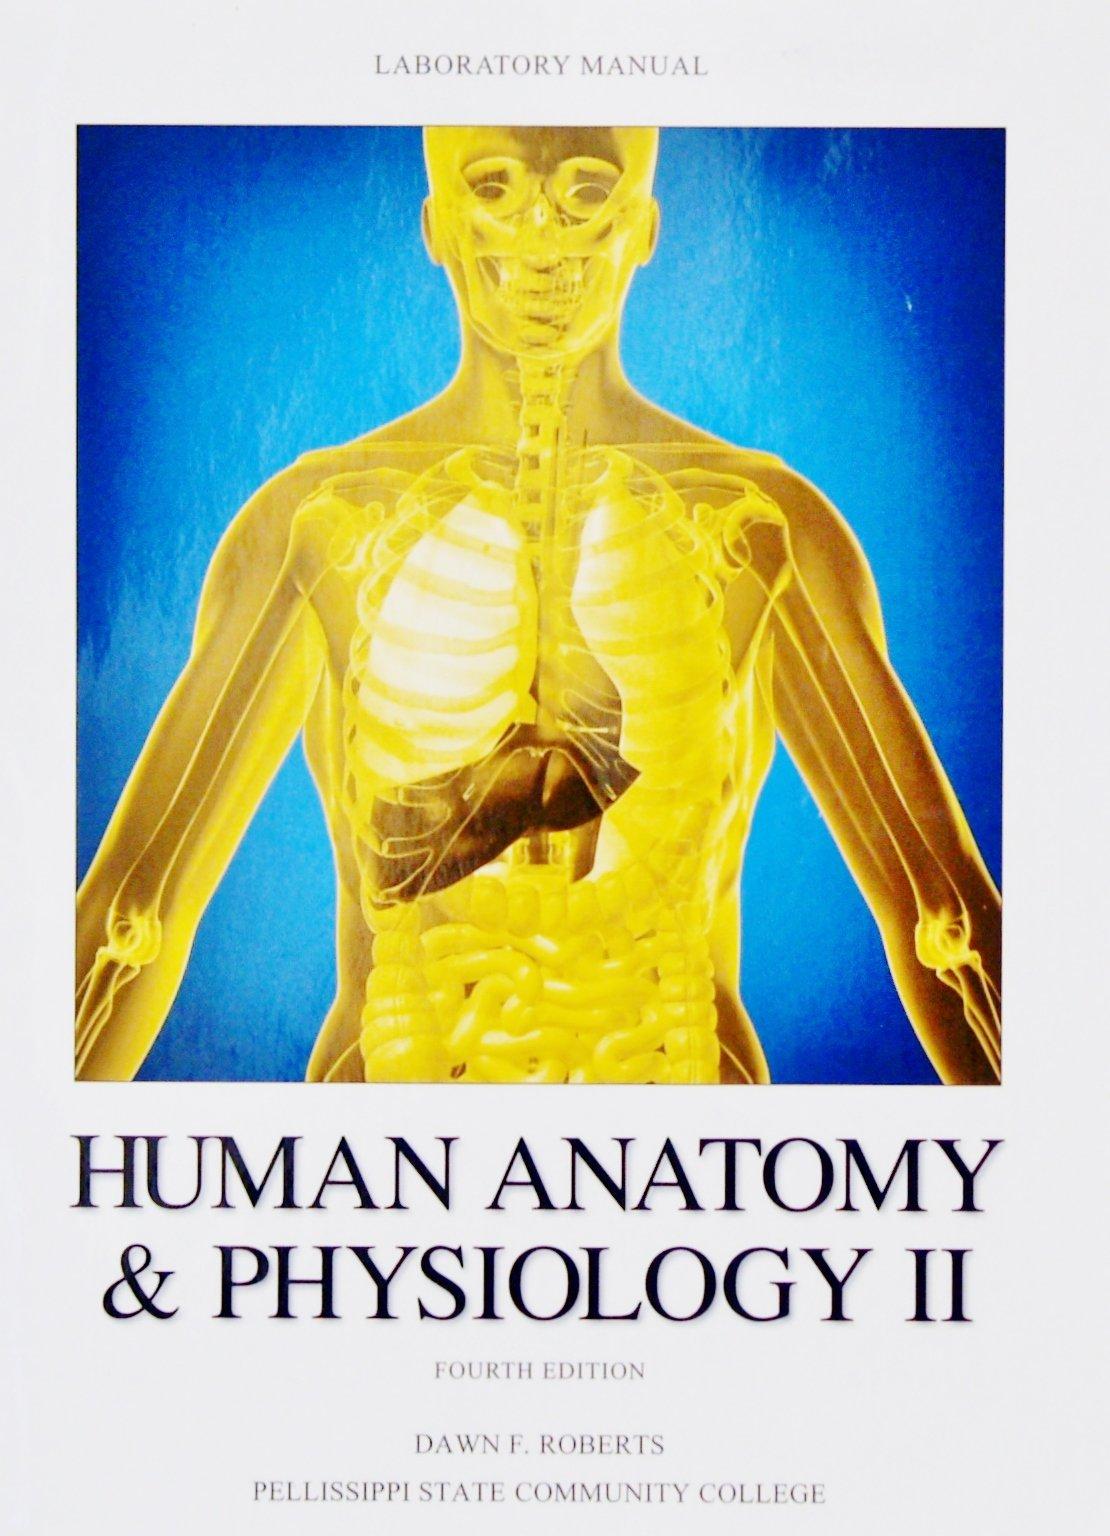 Human Anatomy & Physiology II Fourth Edition Laboratory Manual ...